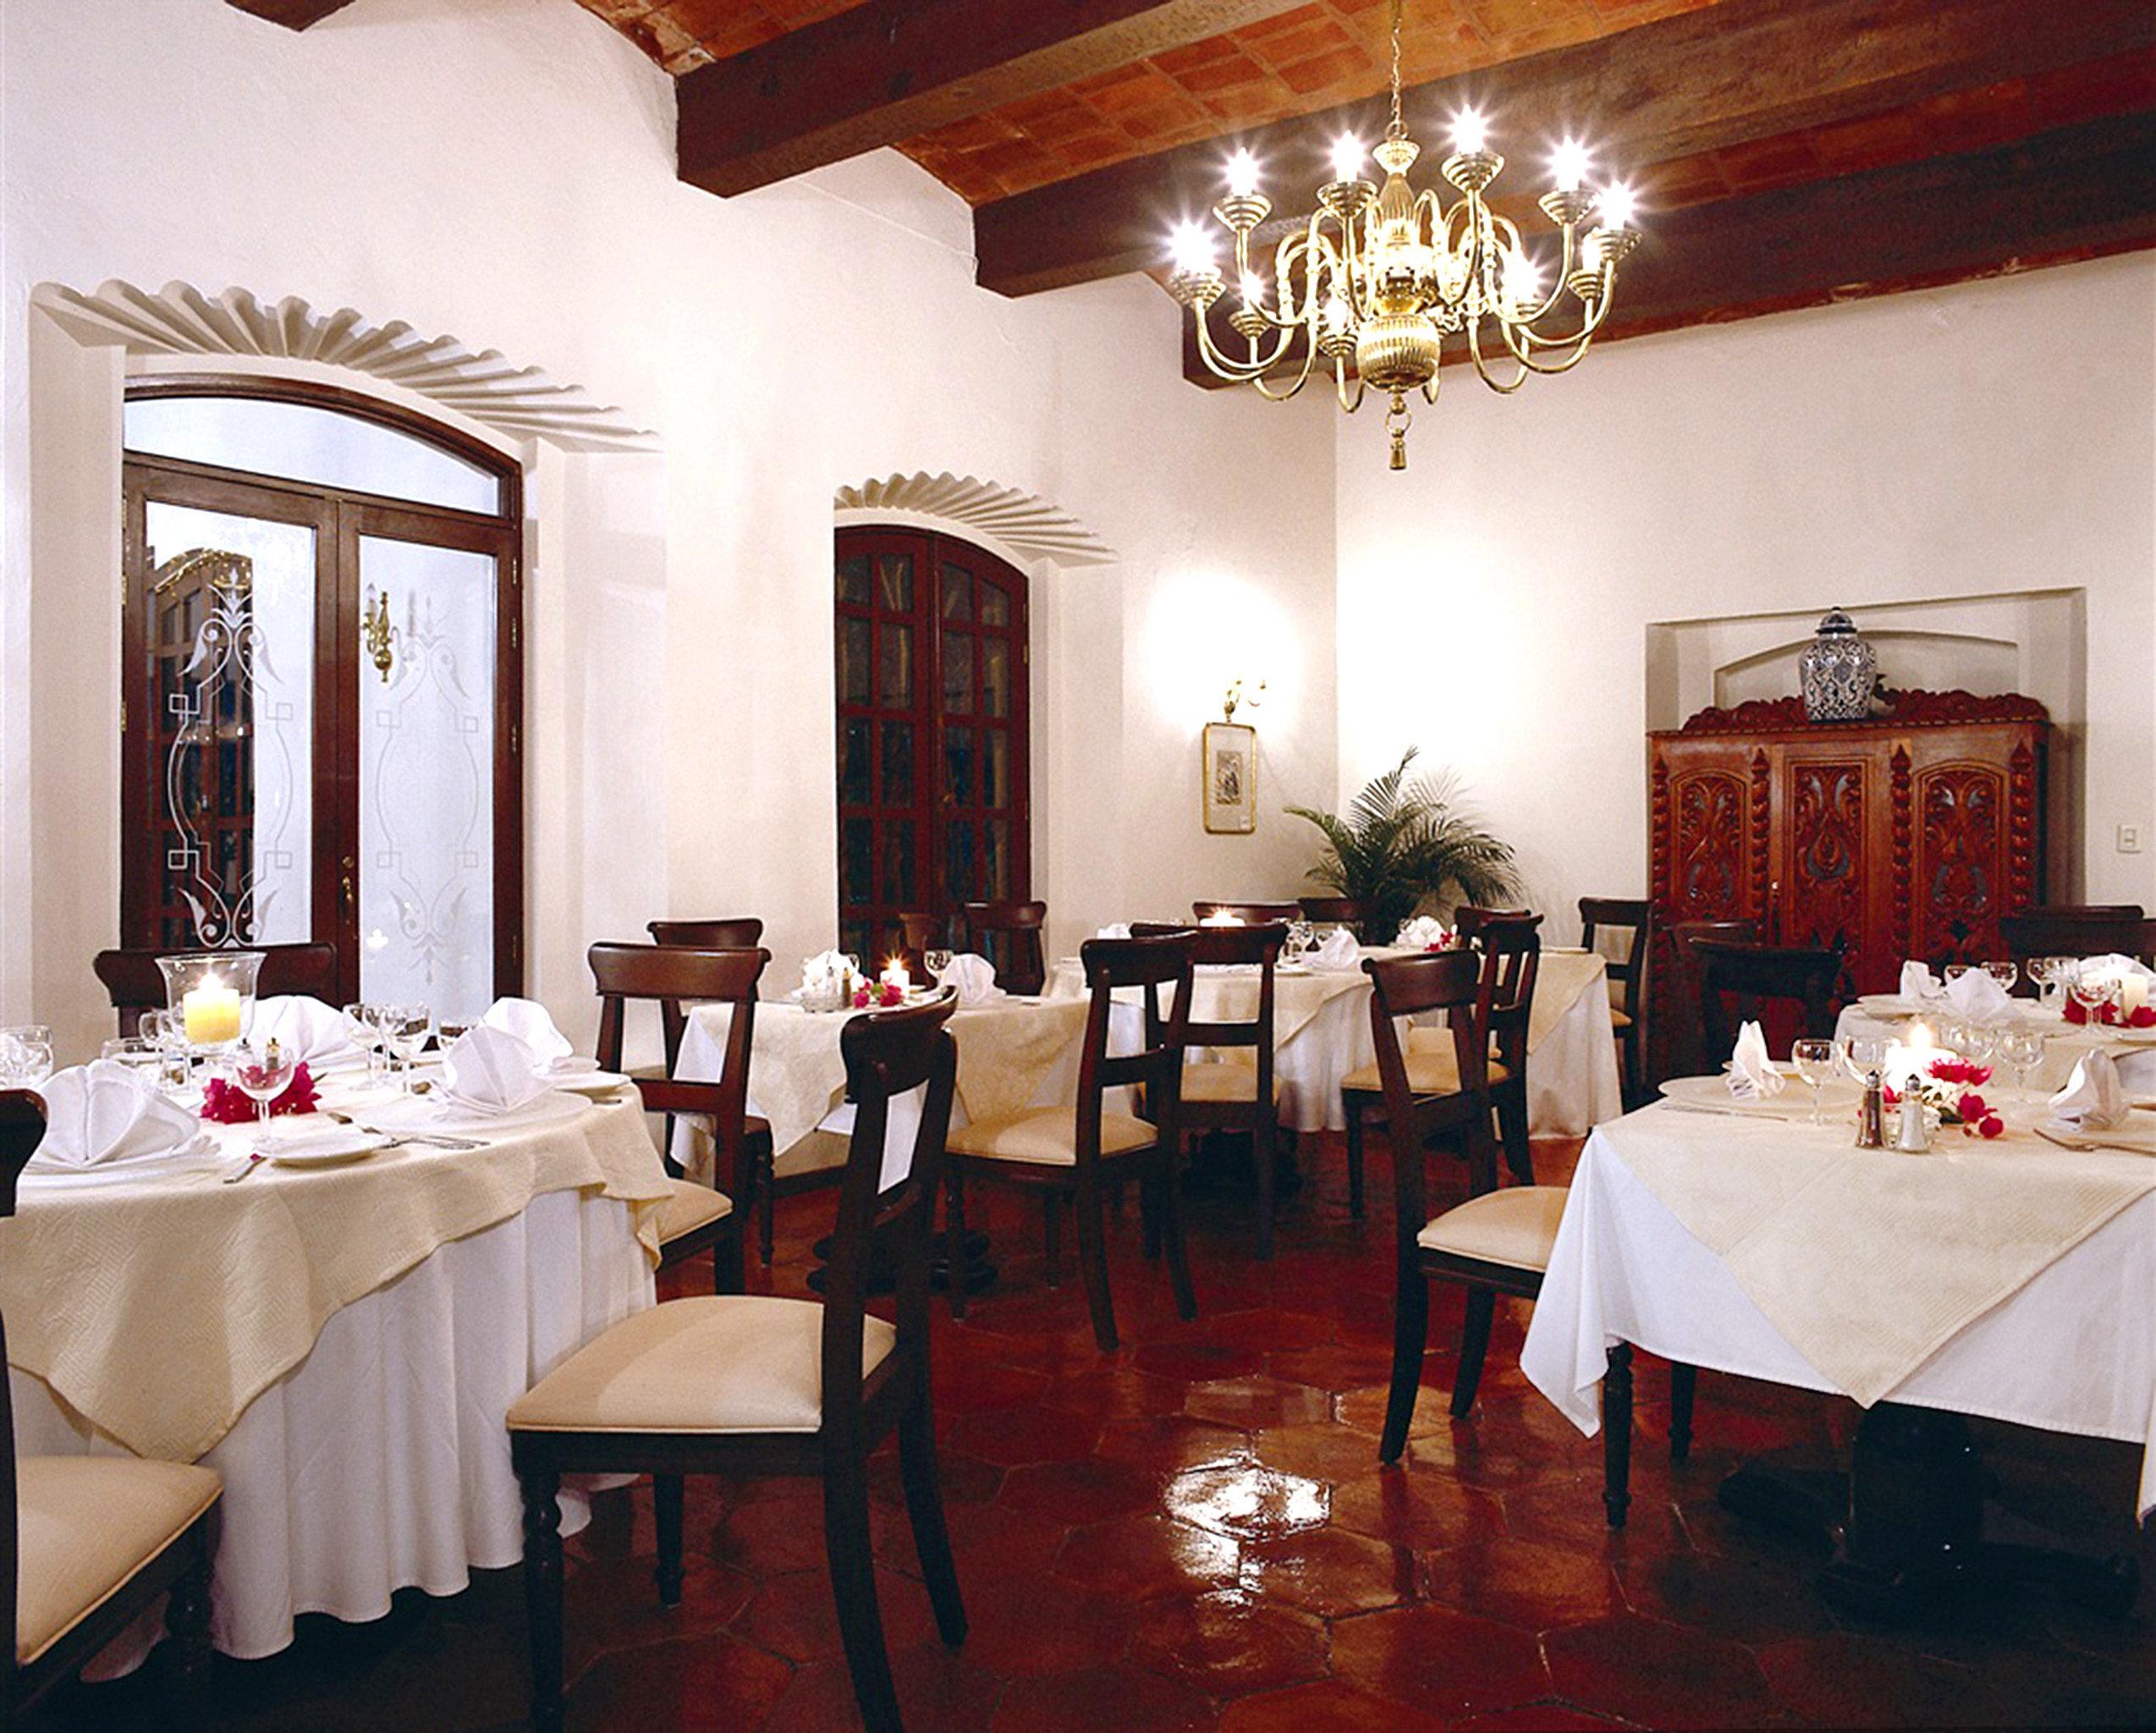 Dining Drink Eat restaurant function hall ceremony ballroom banquet dining table